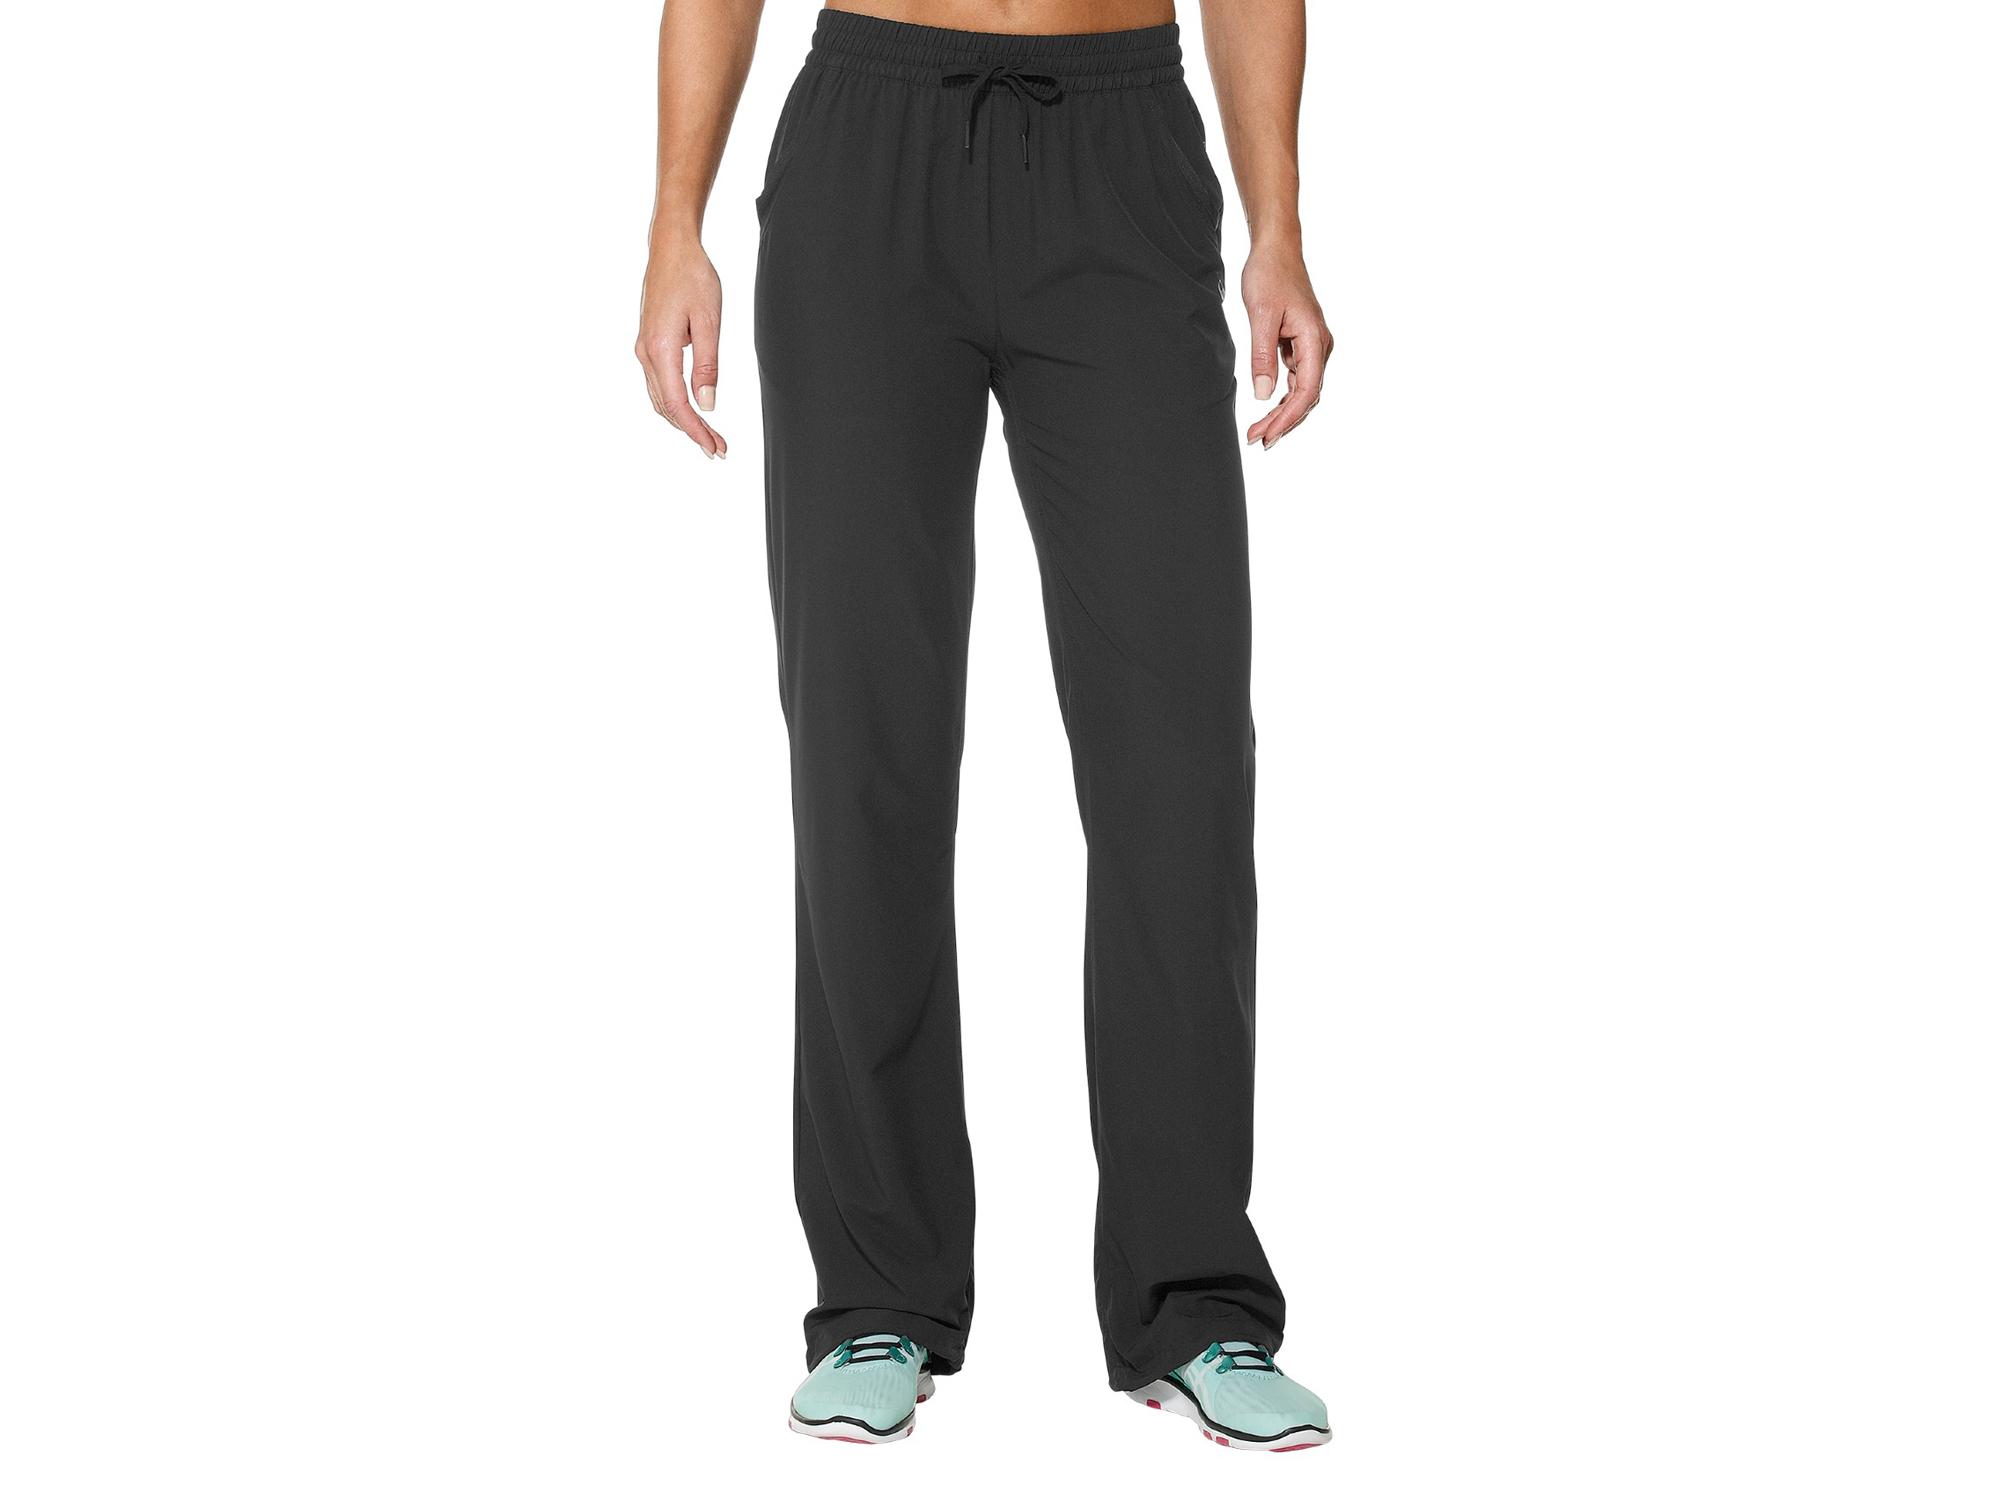 Женские брюки асикс Styled Woven Pant black (121810 0904) фото